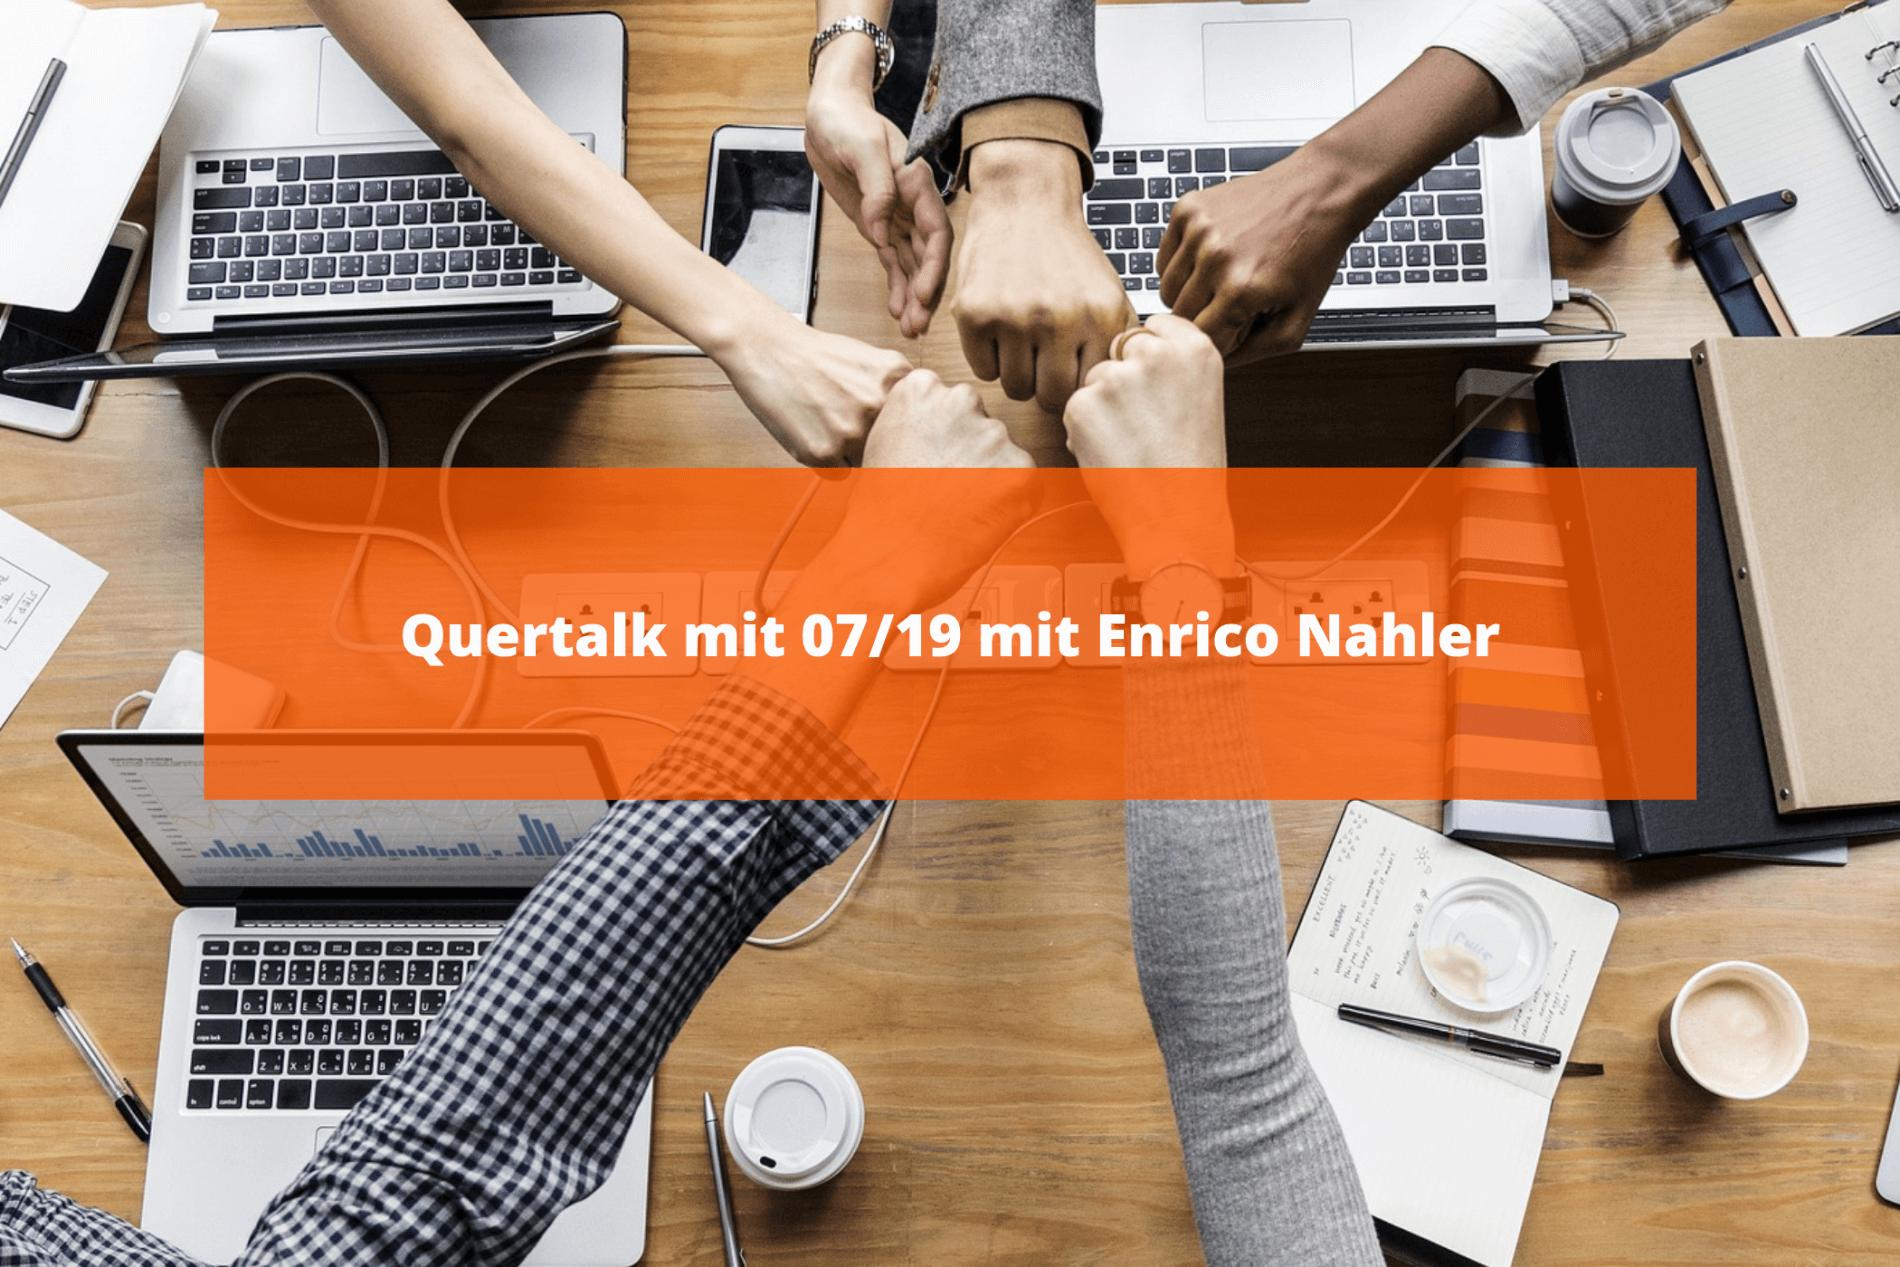 Quertalk 07/19 mit Enrico Nahler